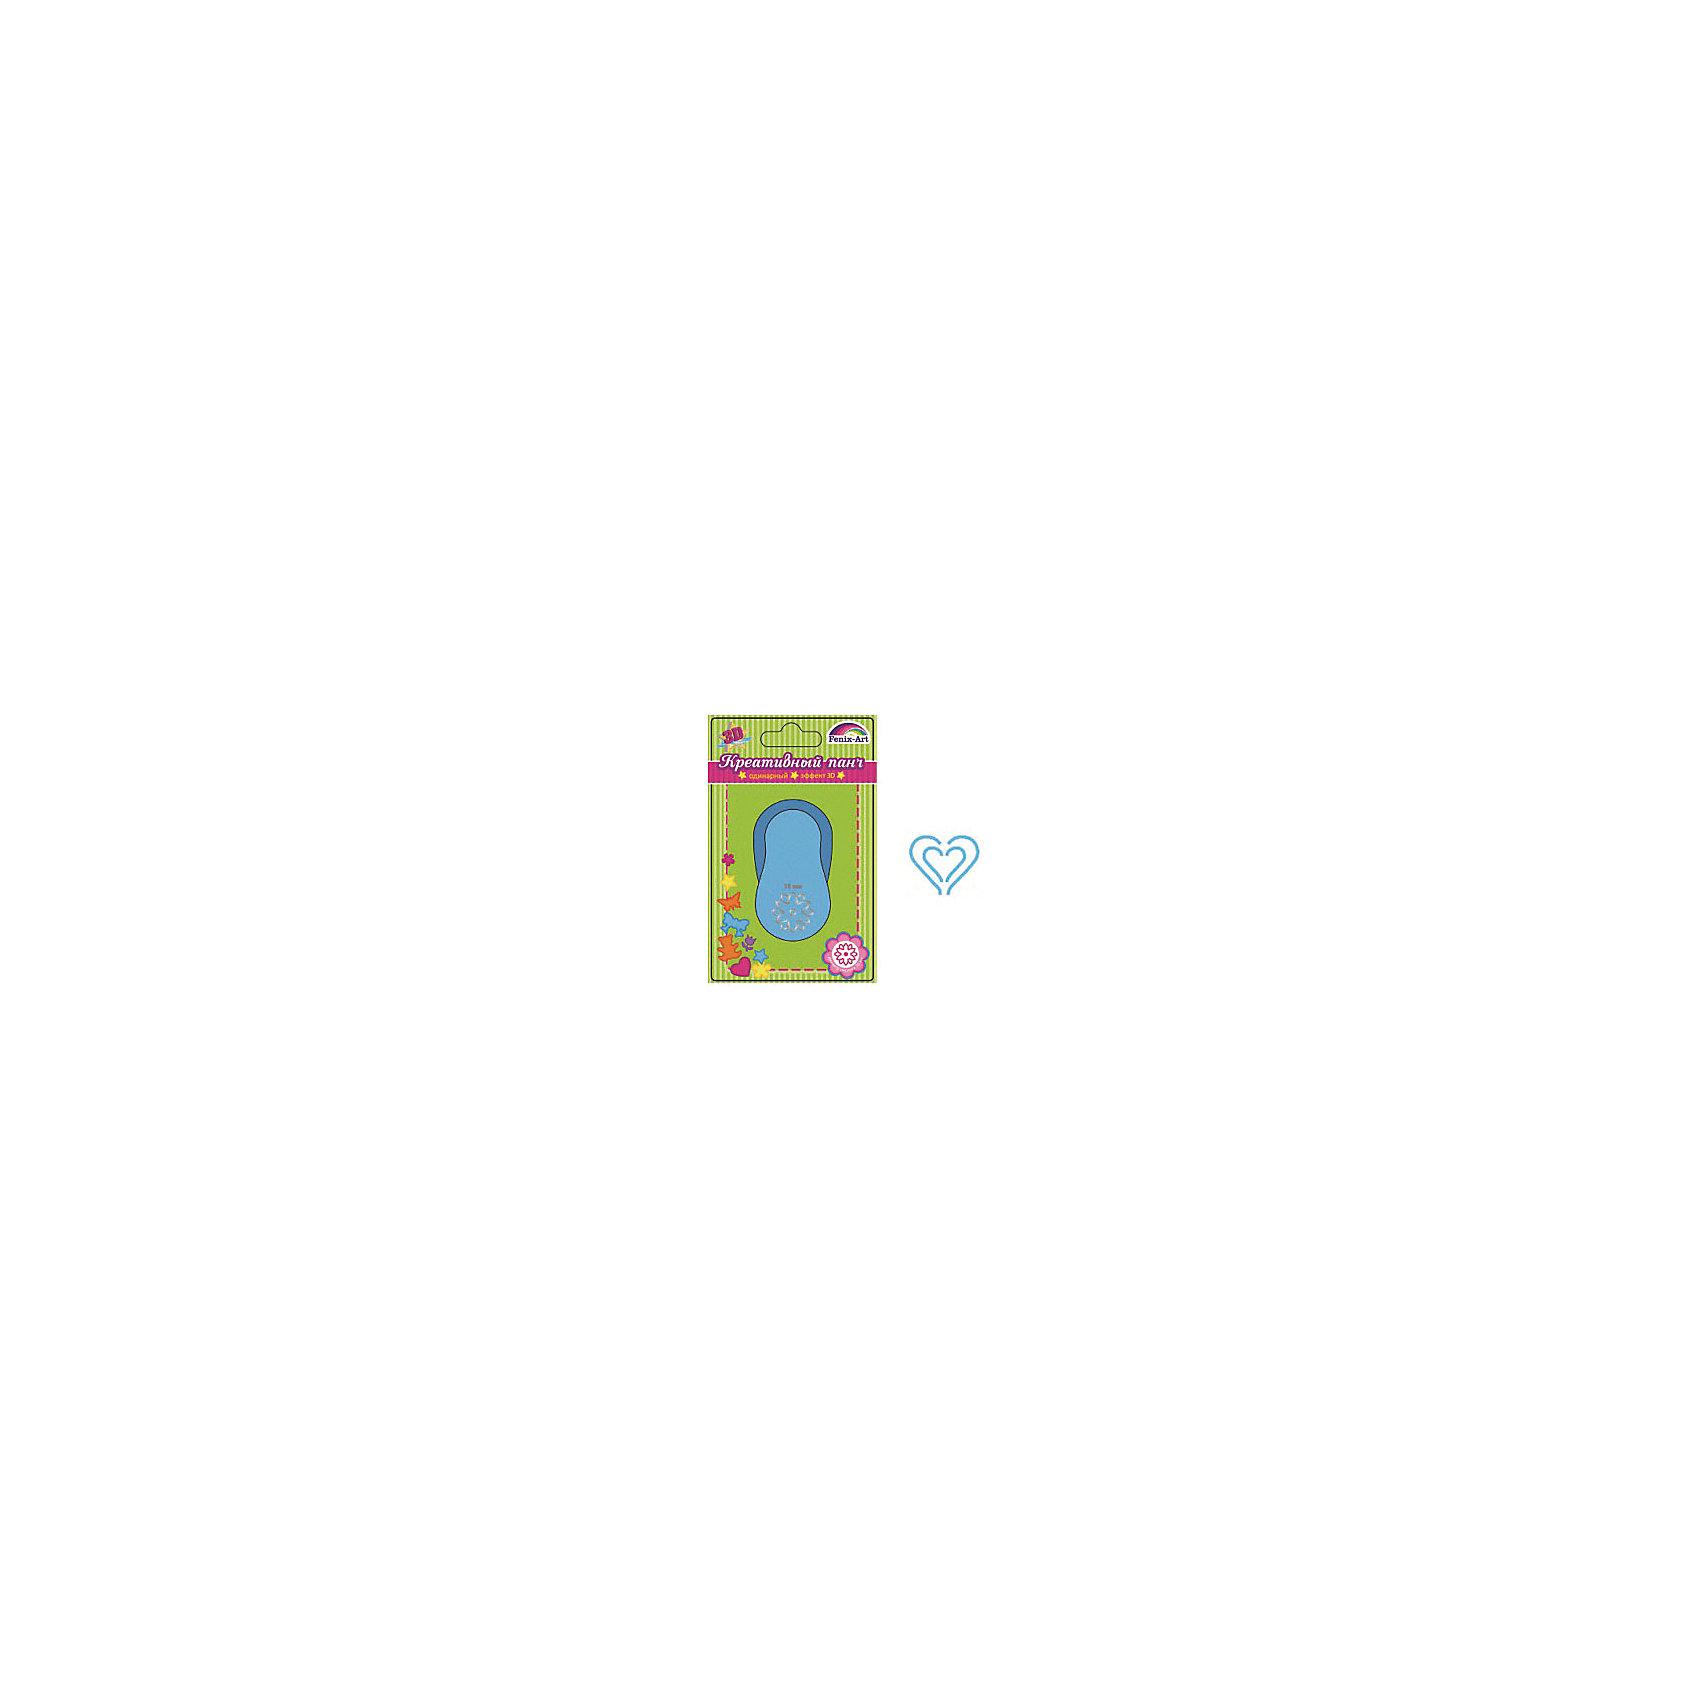 Панч-дырокол одинарный 38 ммСердечко Феникс+Бумага<br>Панч-дырокол одинарный  СЕРДЕЧКО/38 (размер рисунка 38мм, размер панча 73х45х57, эффект 3D, голубой цвет, в блистере)<br><br>Ширина мм: 160<br>Глубина мм: 100<br>Высота мм: 75<br>Вес г: 215<br>Возраст от месяцев: 72<br>Возраст до месяцев: 2147483647<br>Пол: Унисекс<br>Возраст: Детский<br>SKU: 7046282